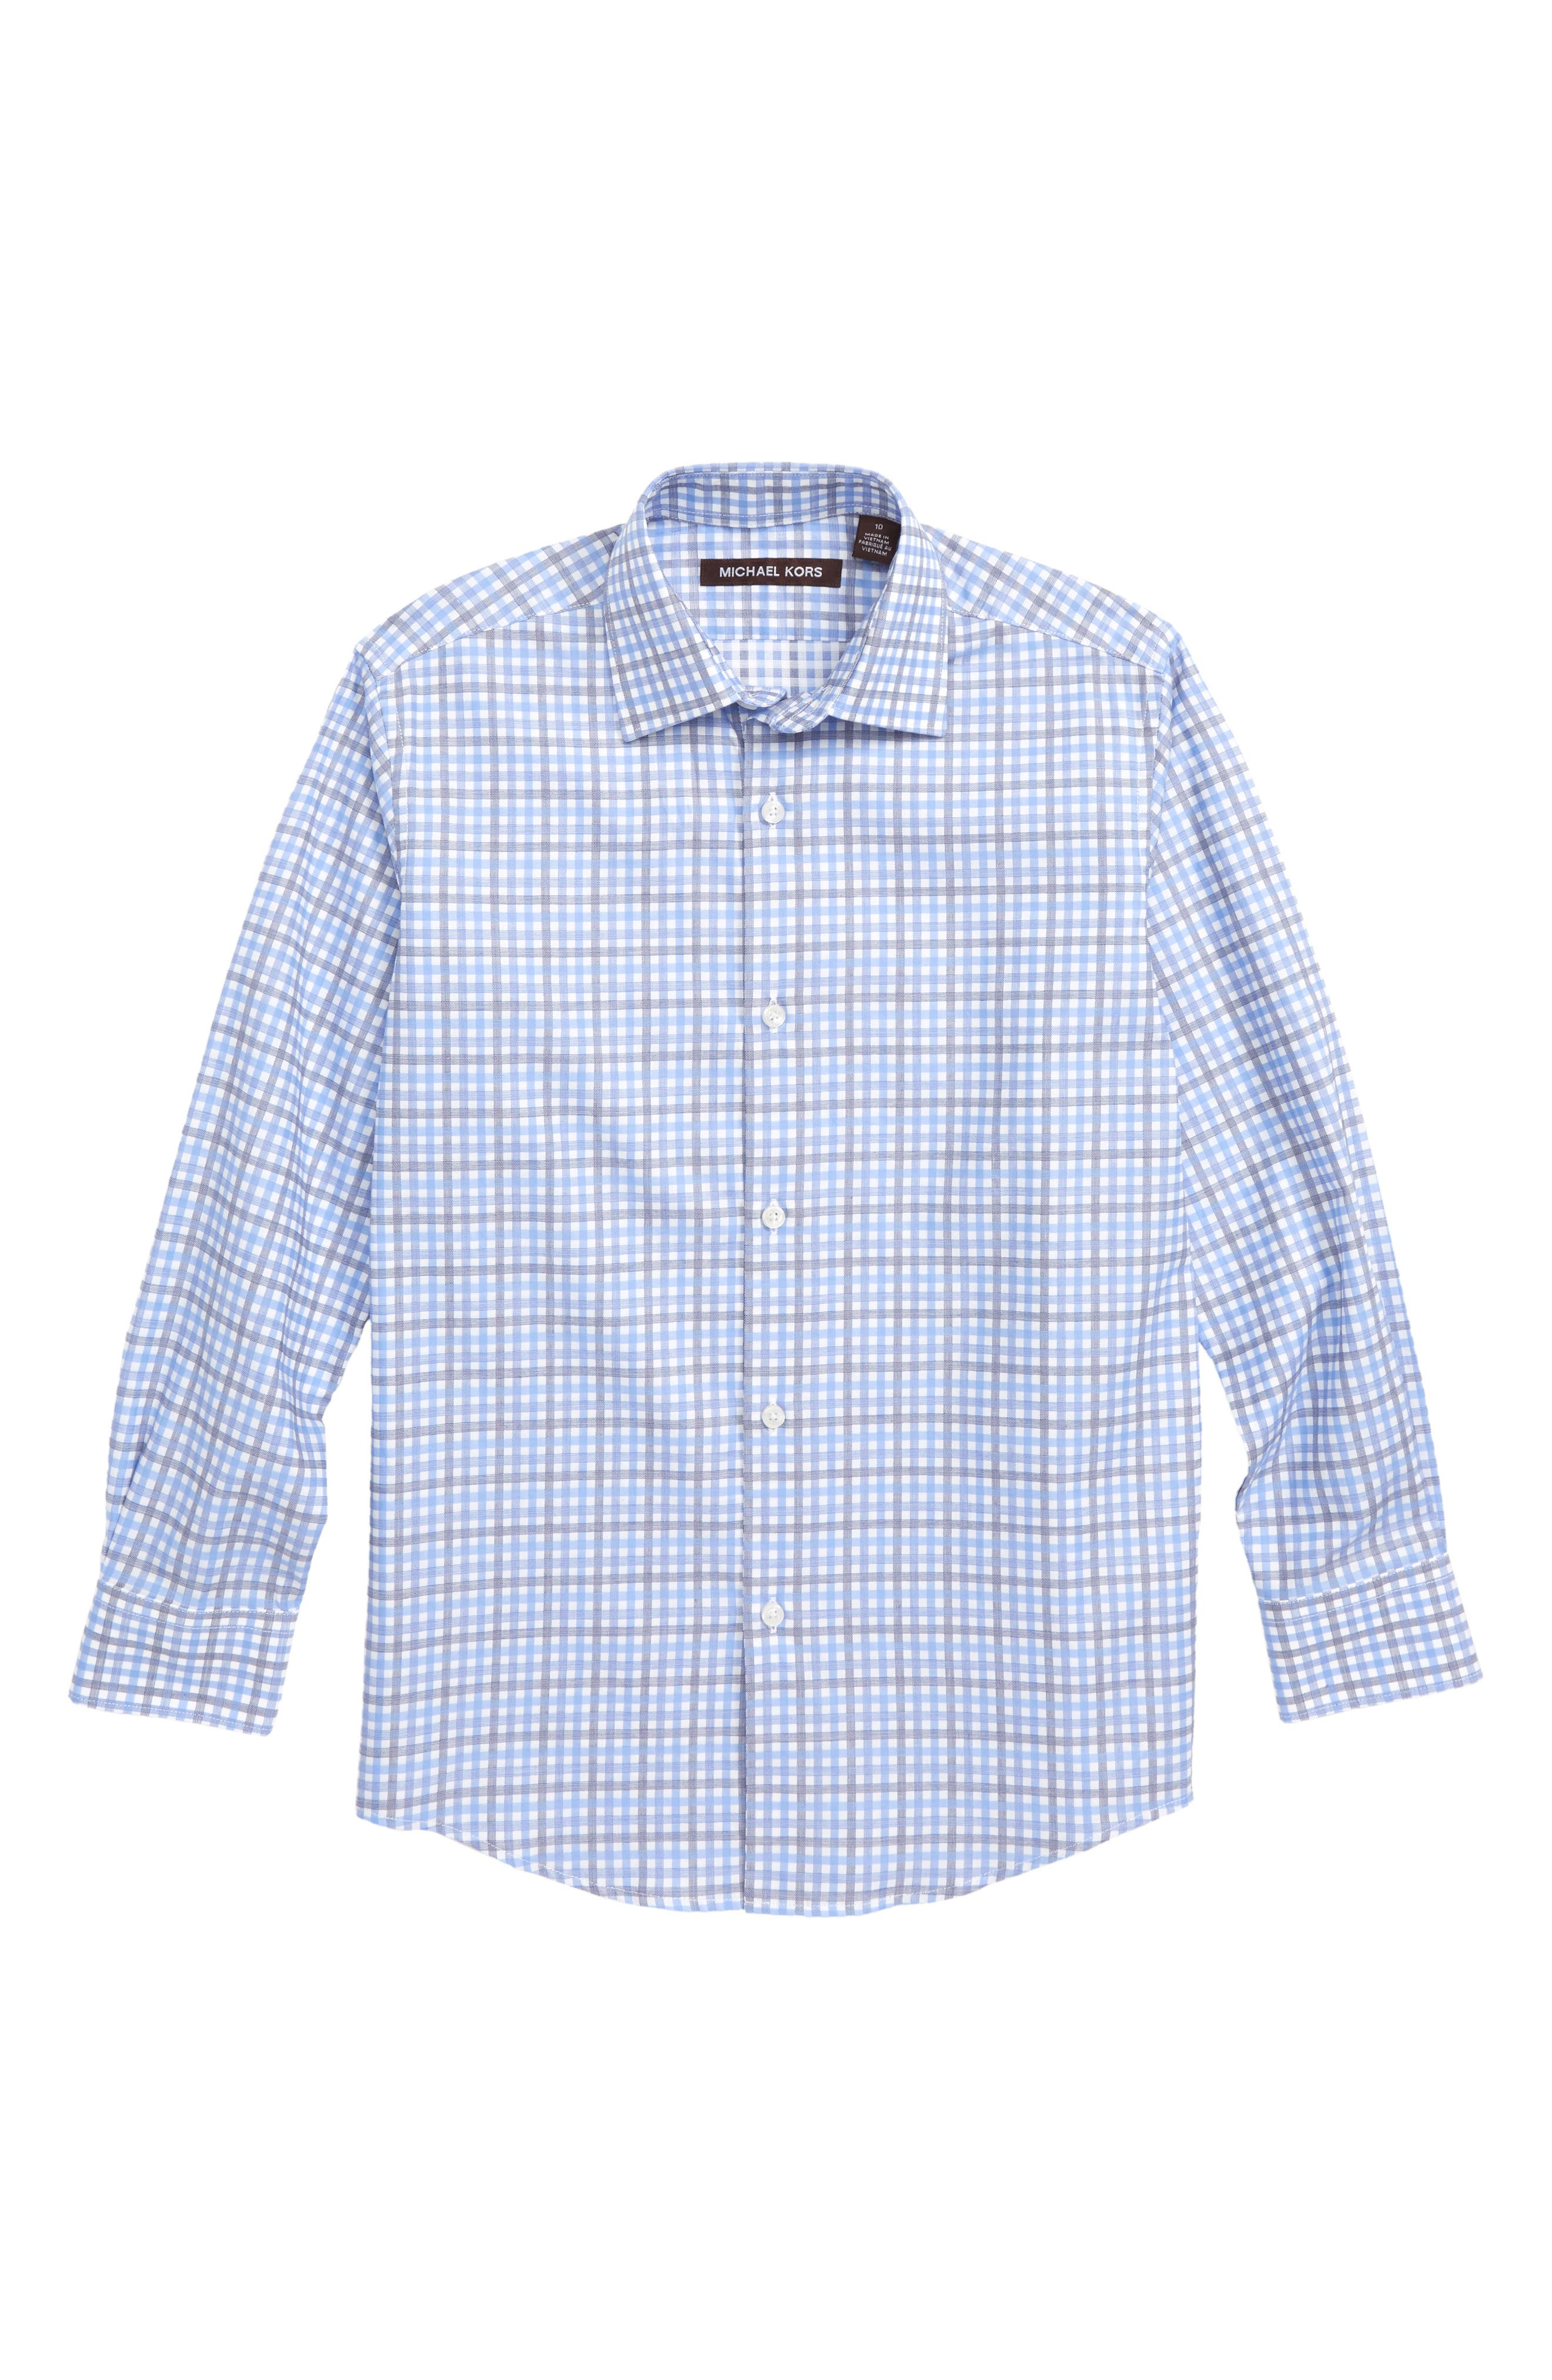 MICHAEL KORS Check Print Dress Shirt, Main, color, BLUE